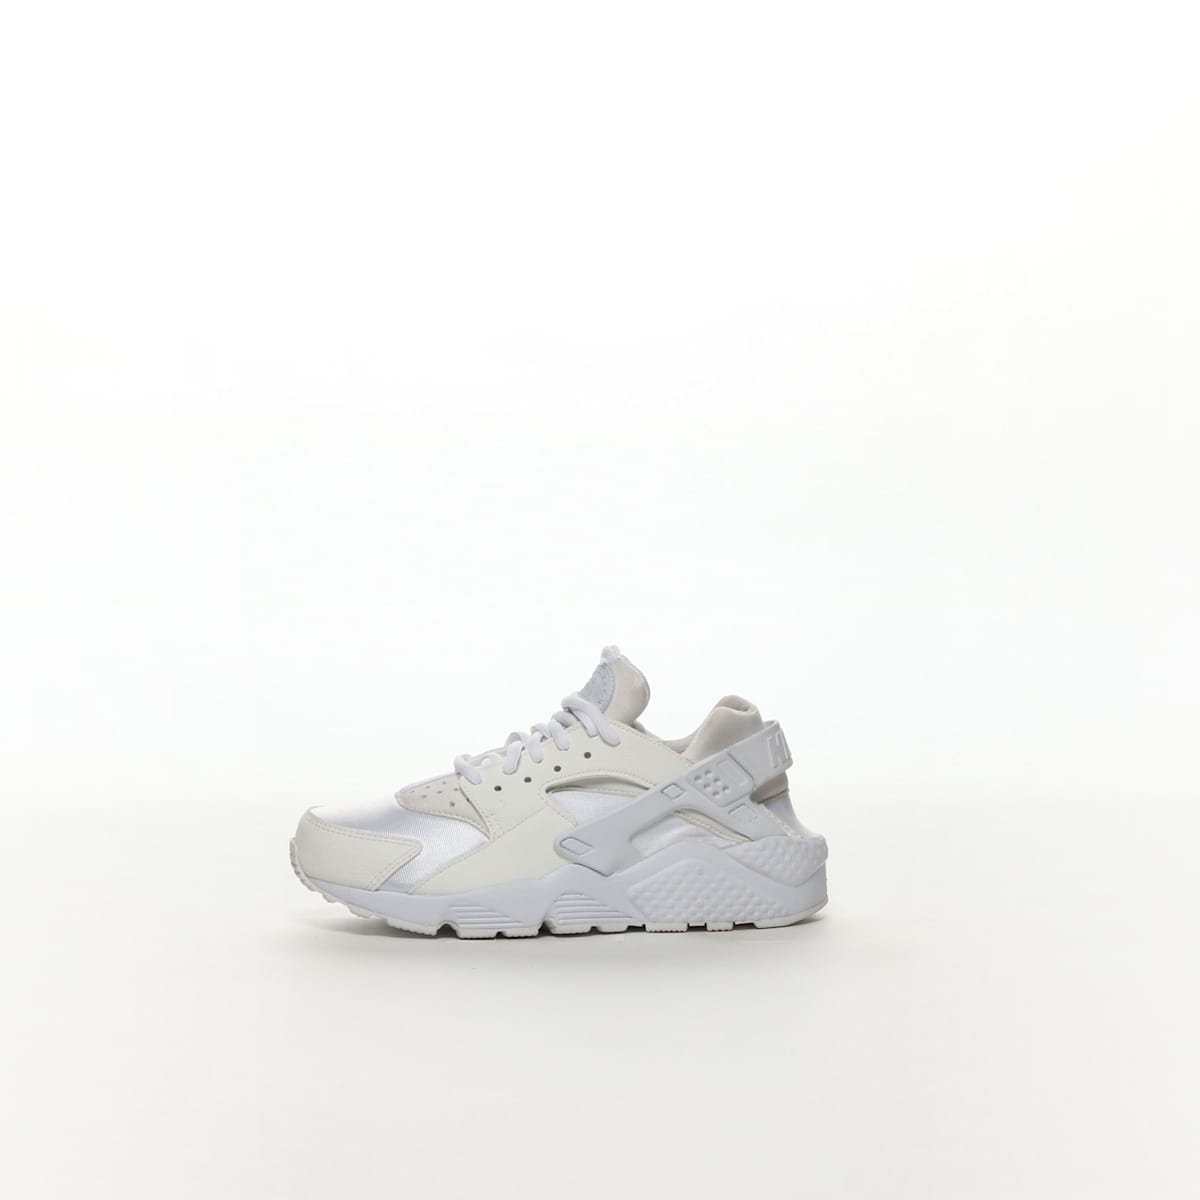 56917d7be3a3 Nike Air Huarache Run Women s Shoe - WHITE WHITE – Resku